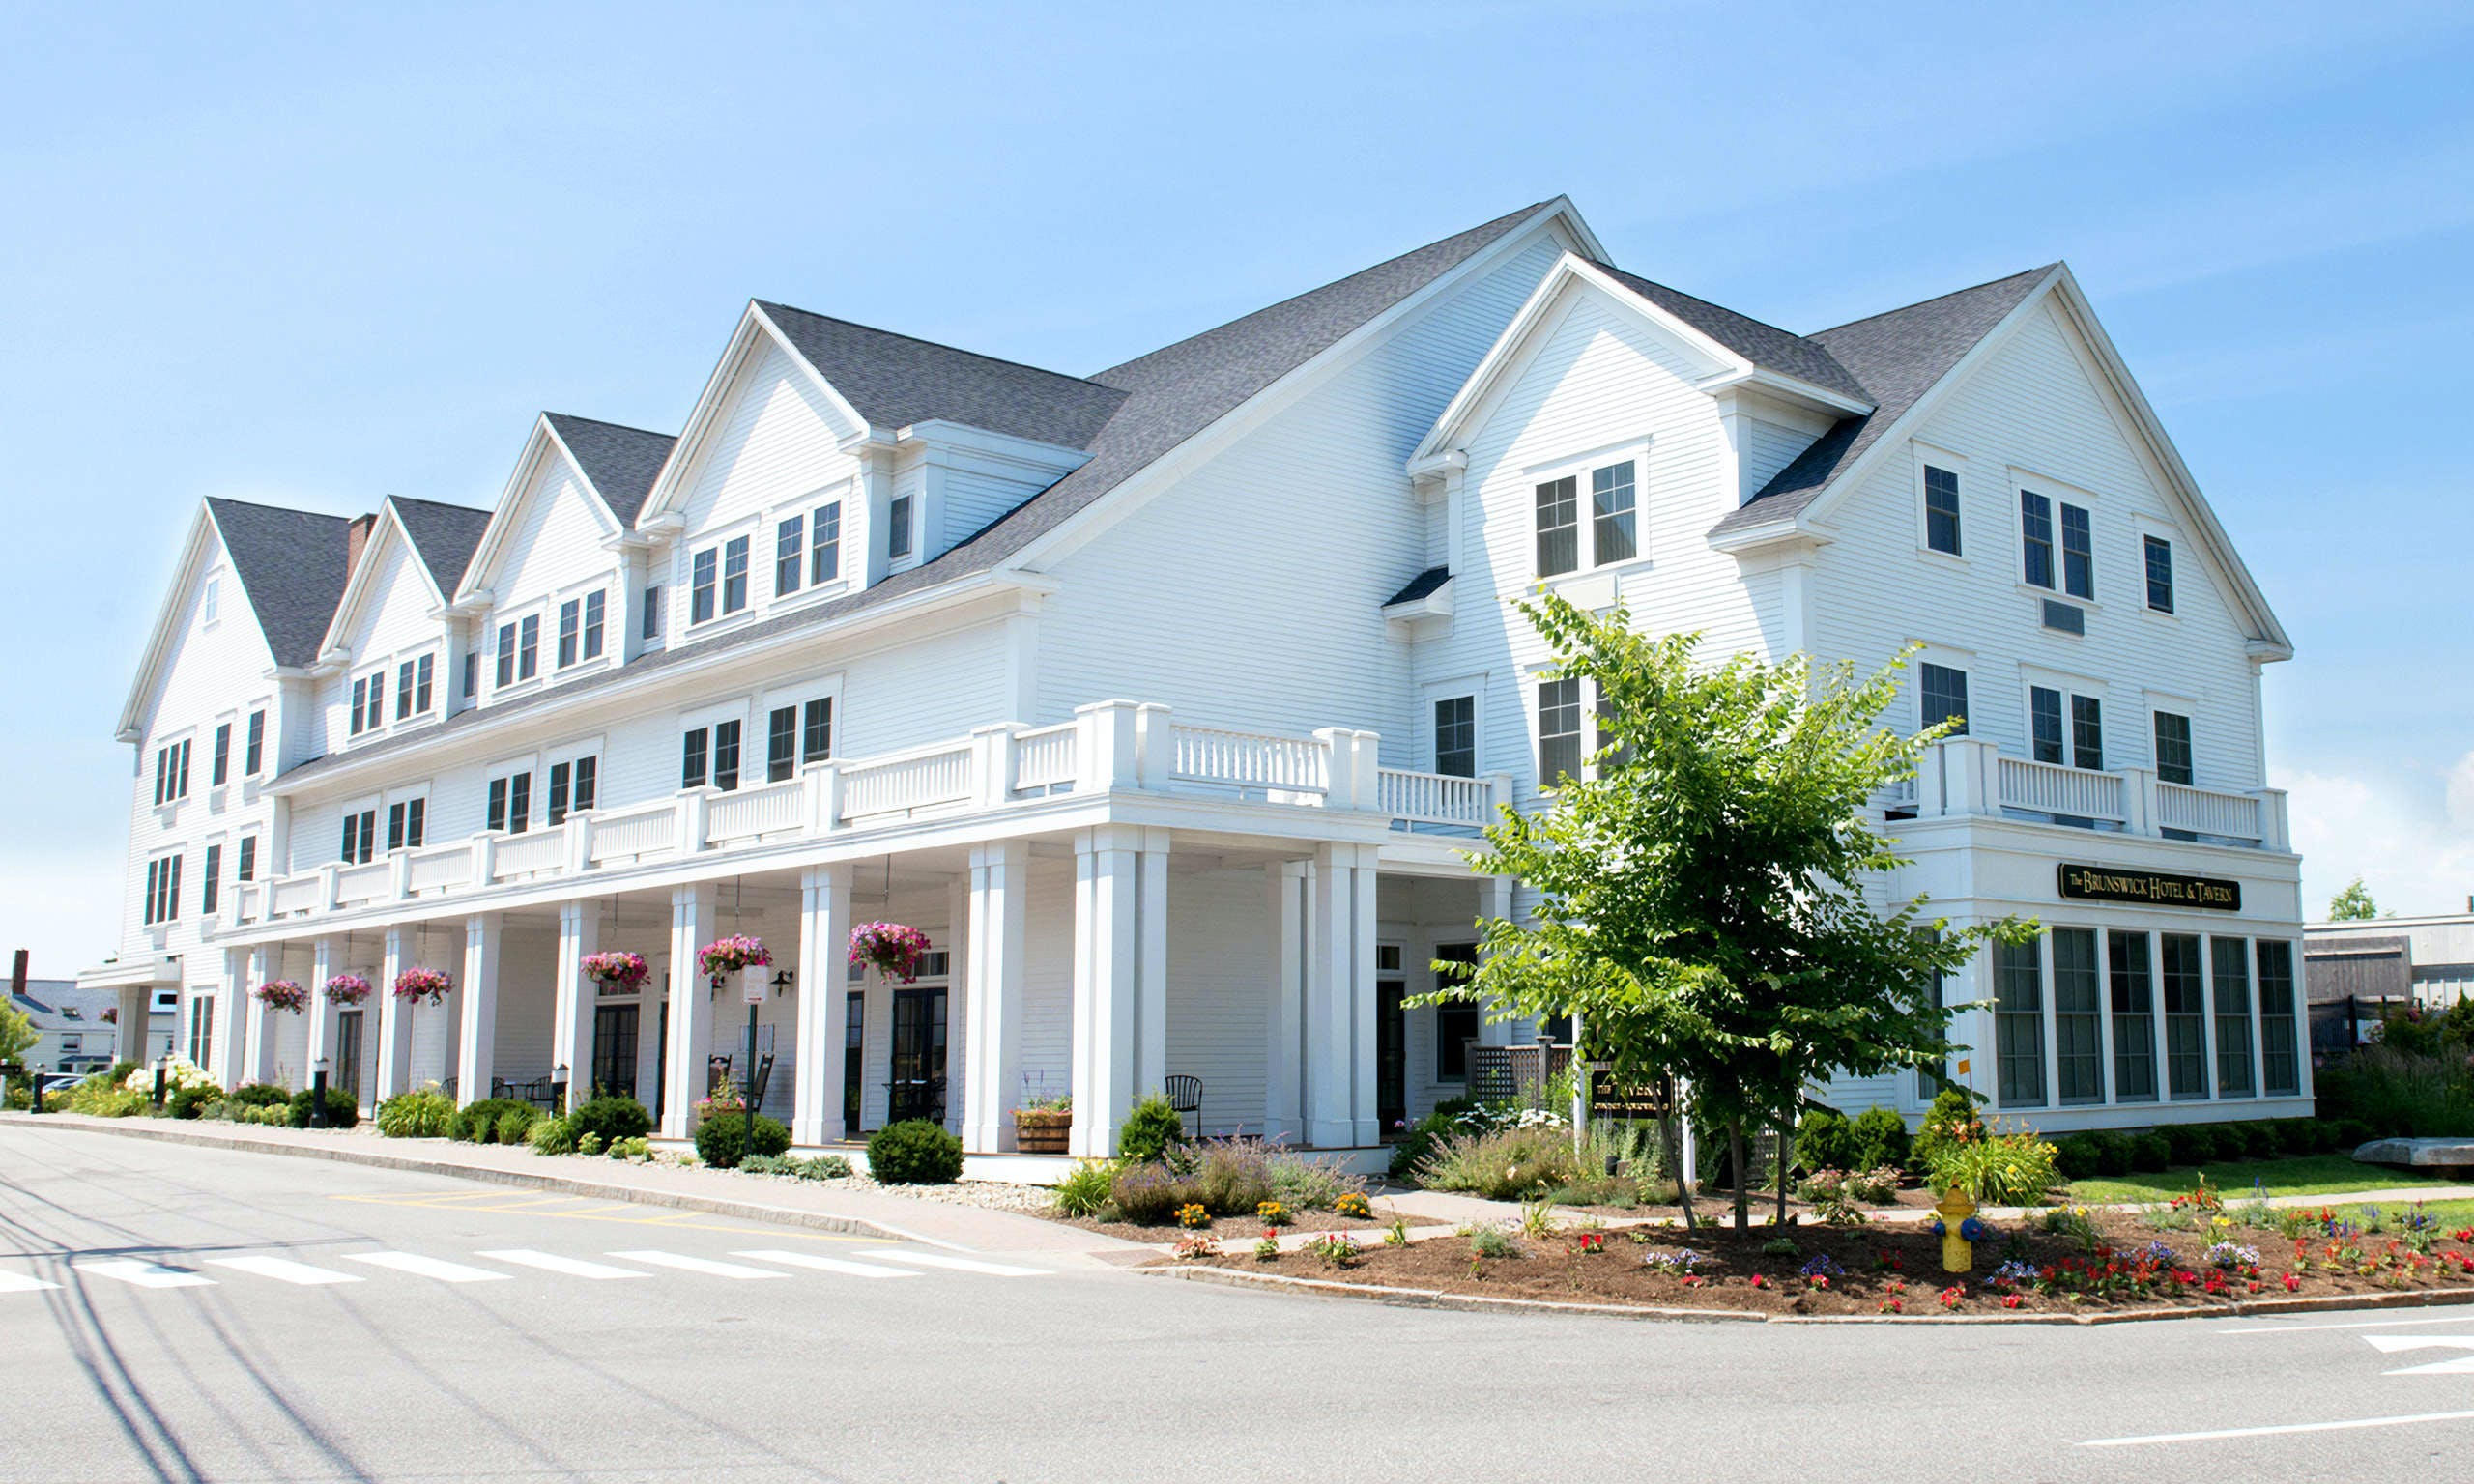 The Brunswick Hotel & Tavern